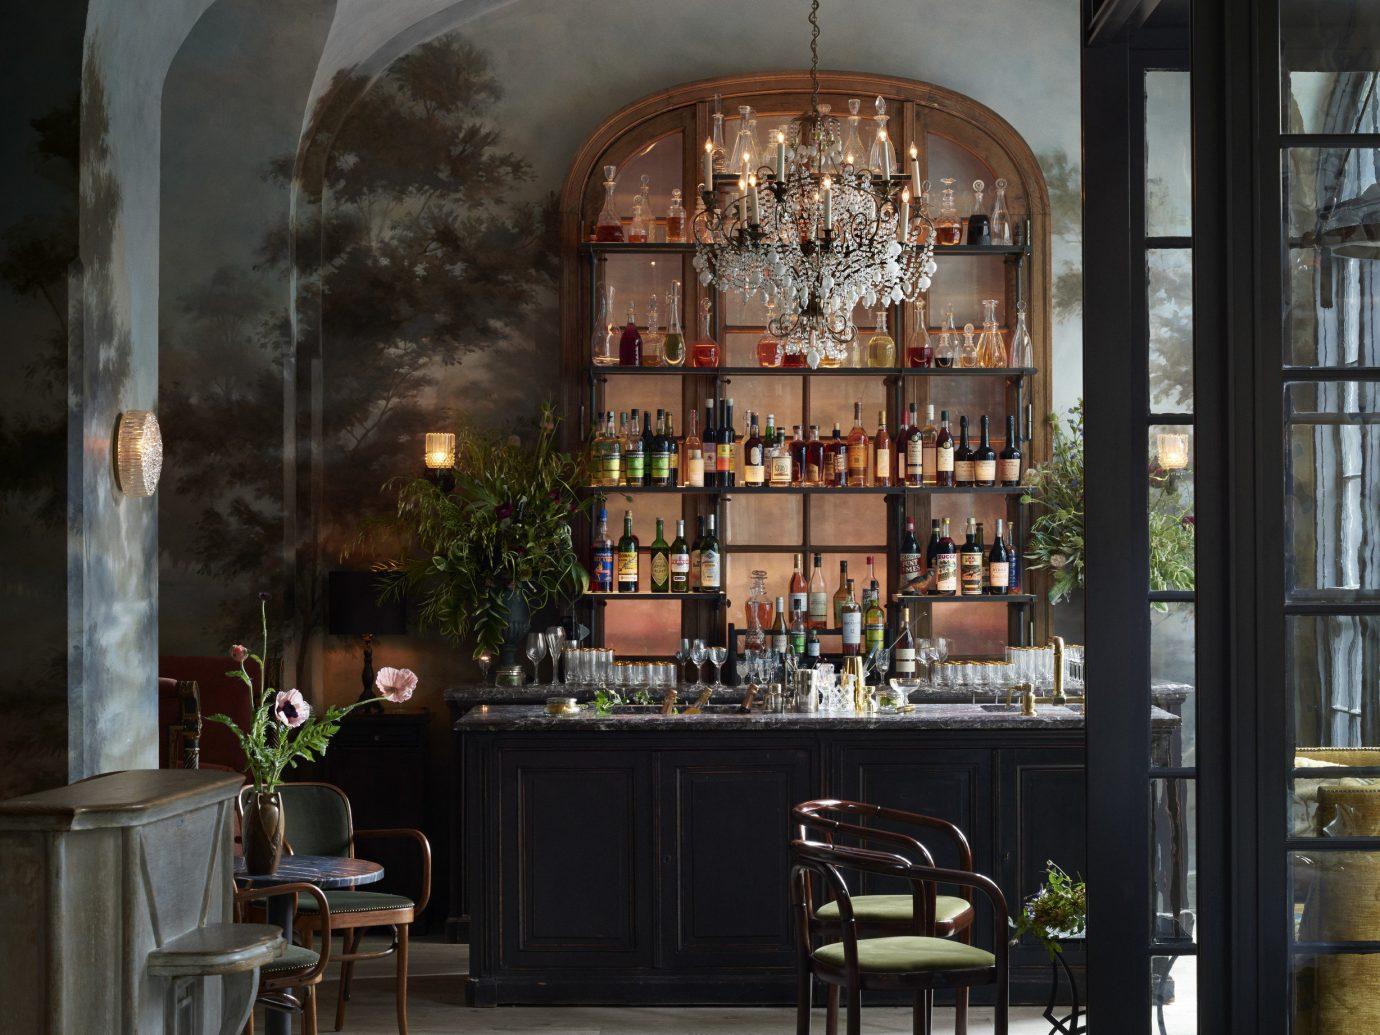 Bar at Le Coucou